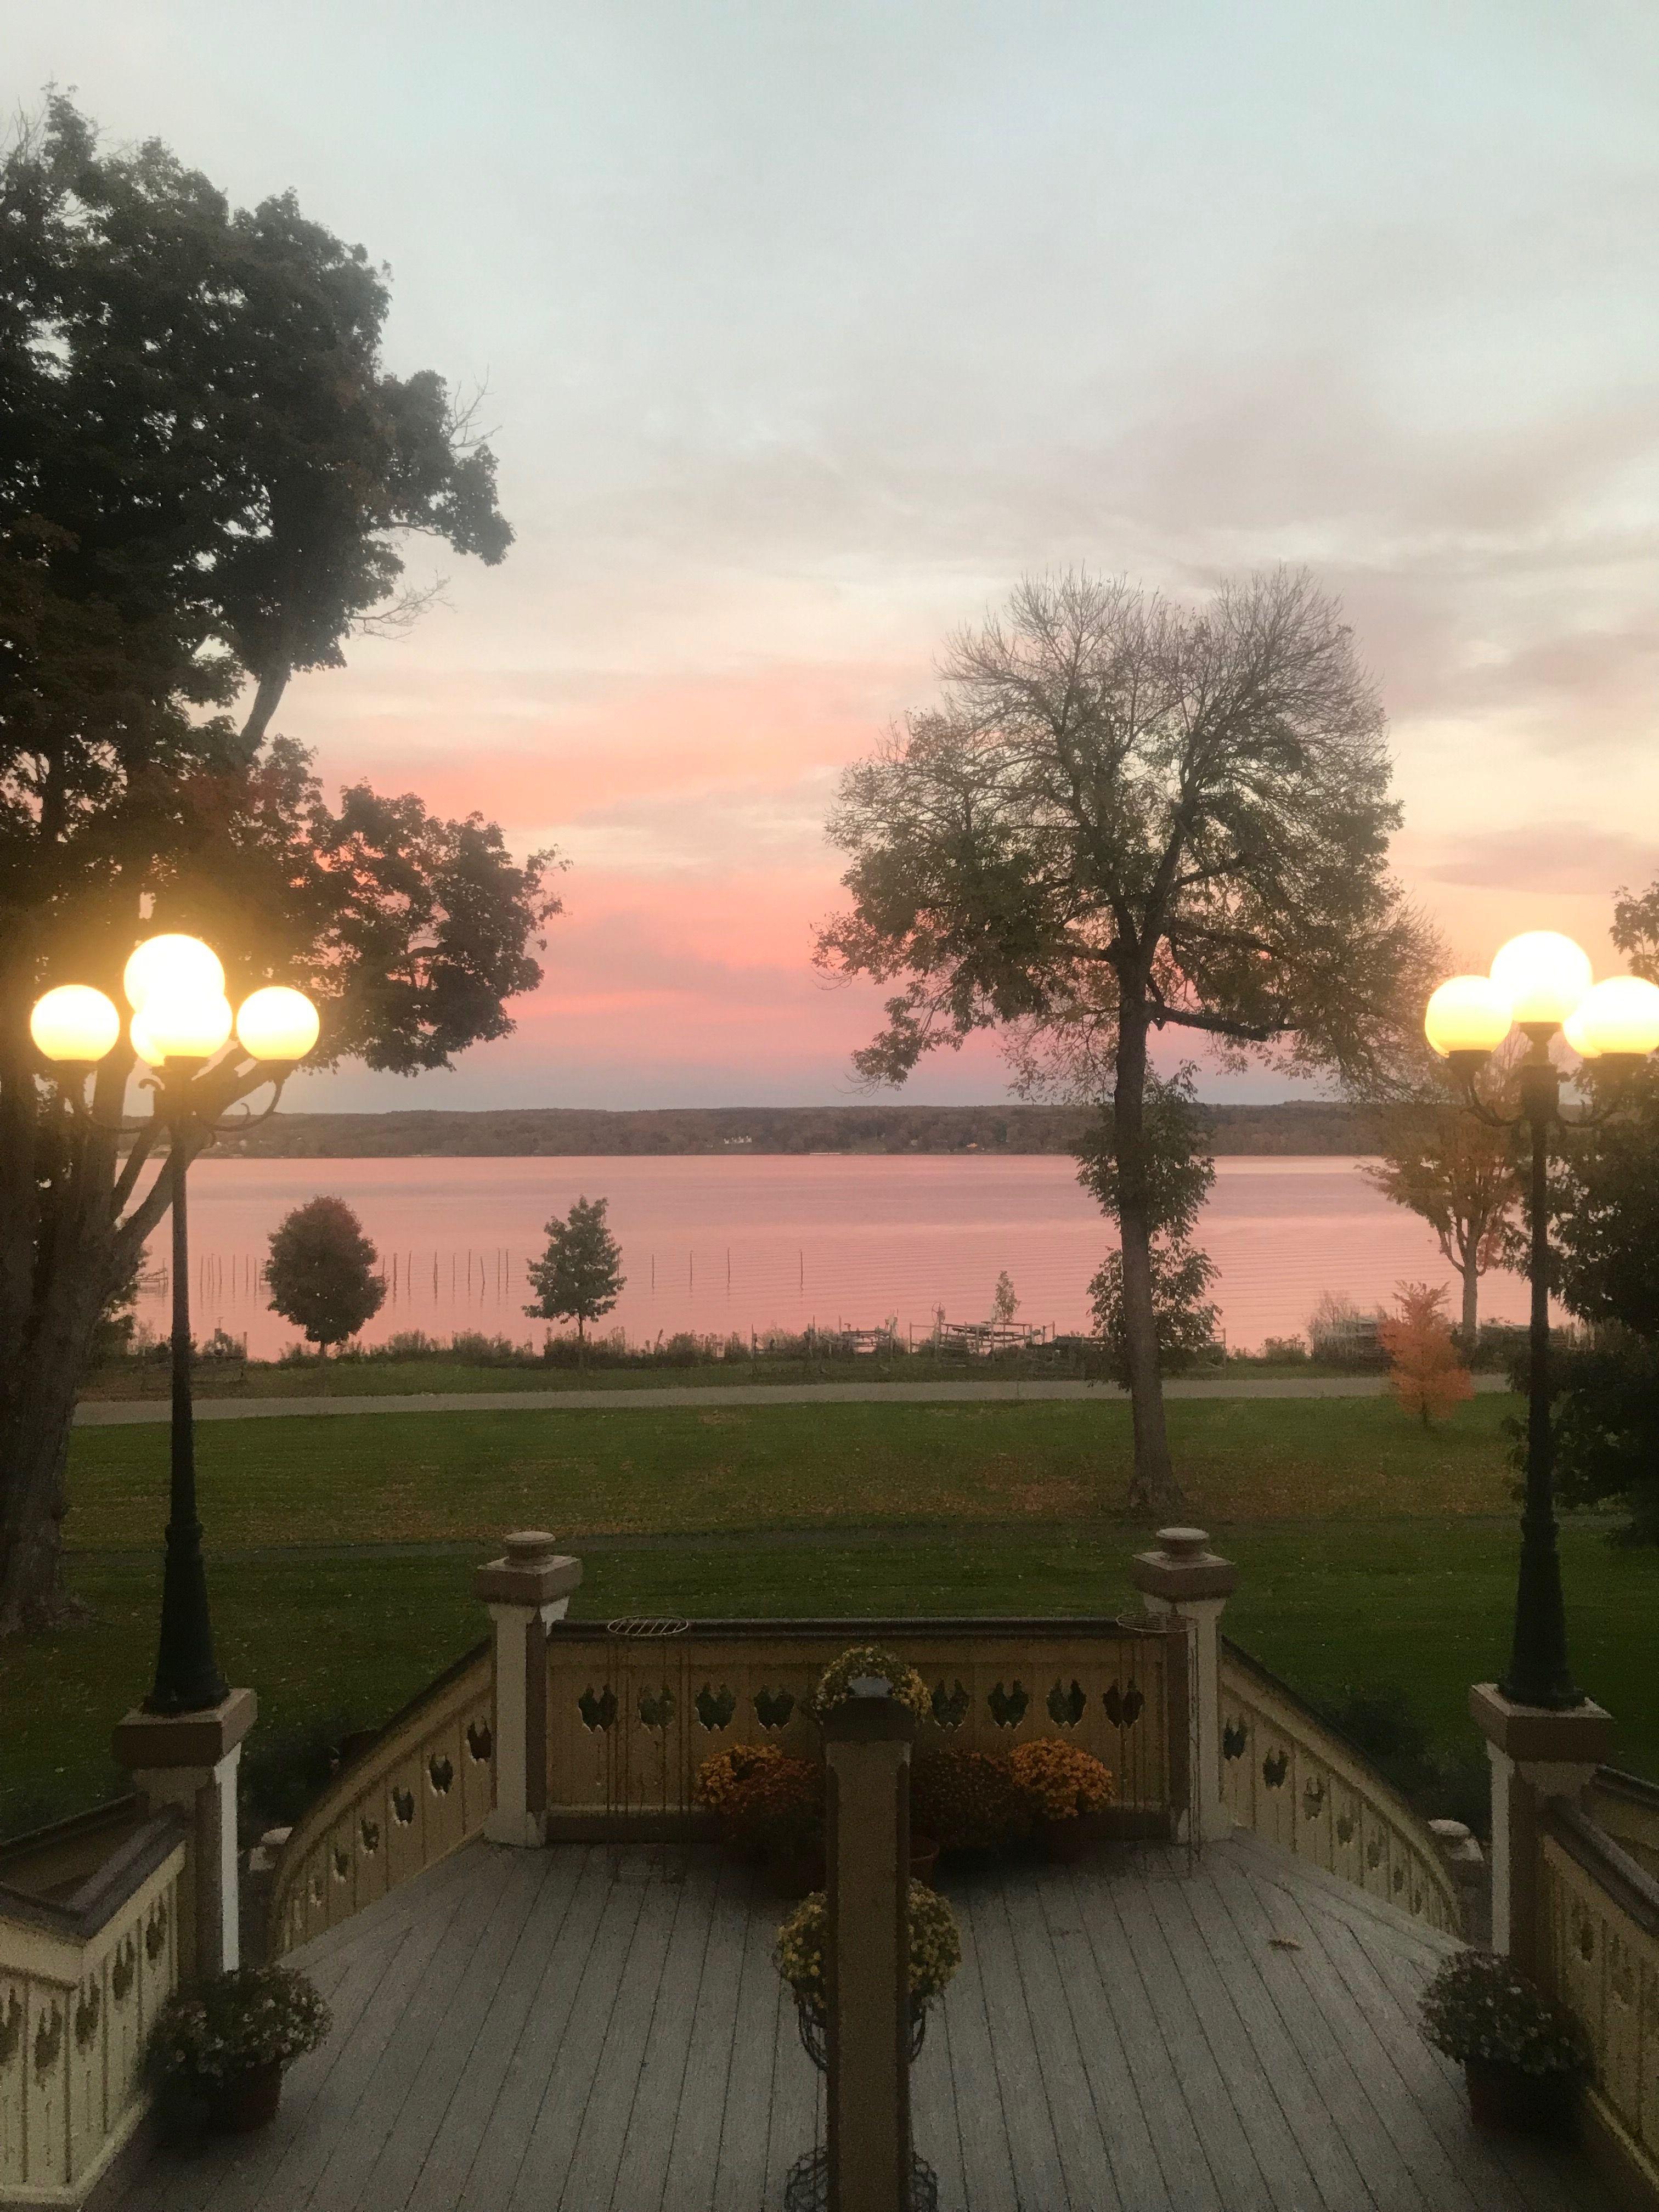 Chautauqua lake from the athenaeum hotel porch